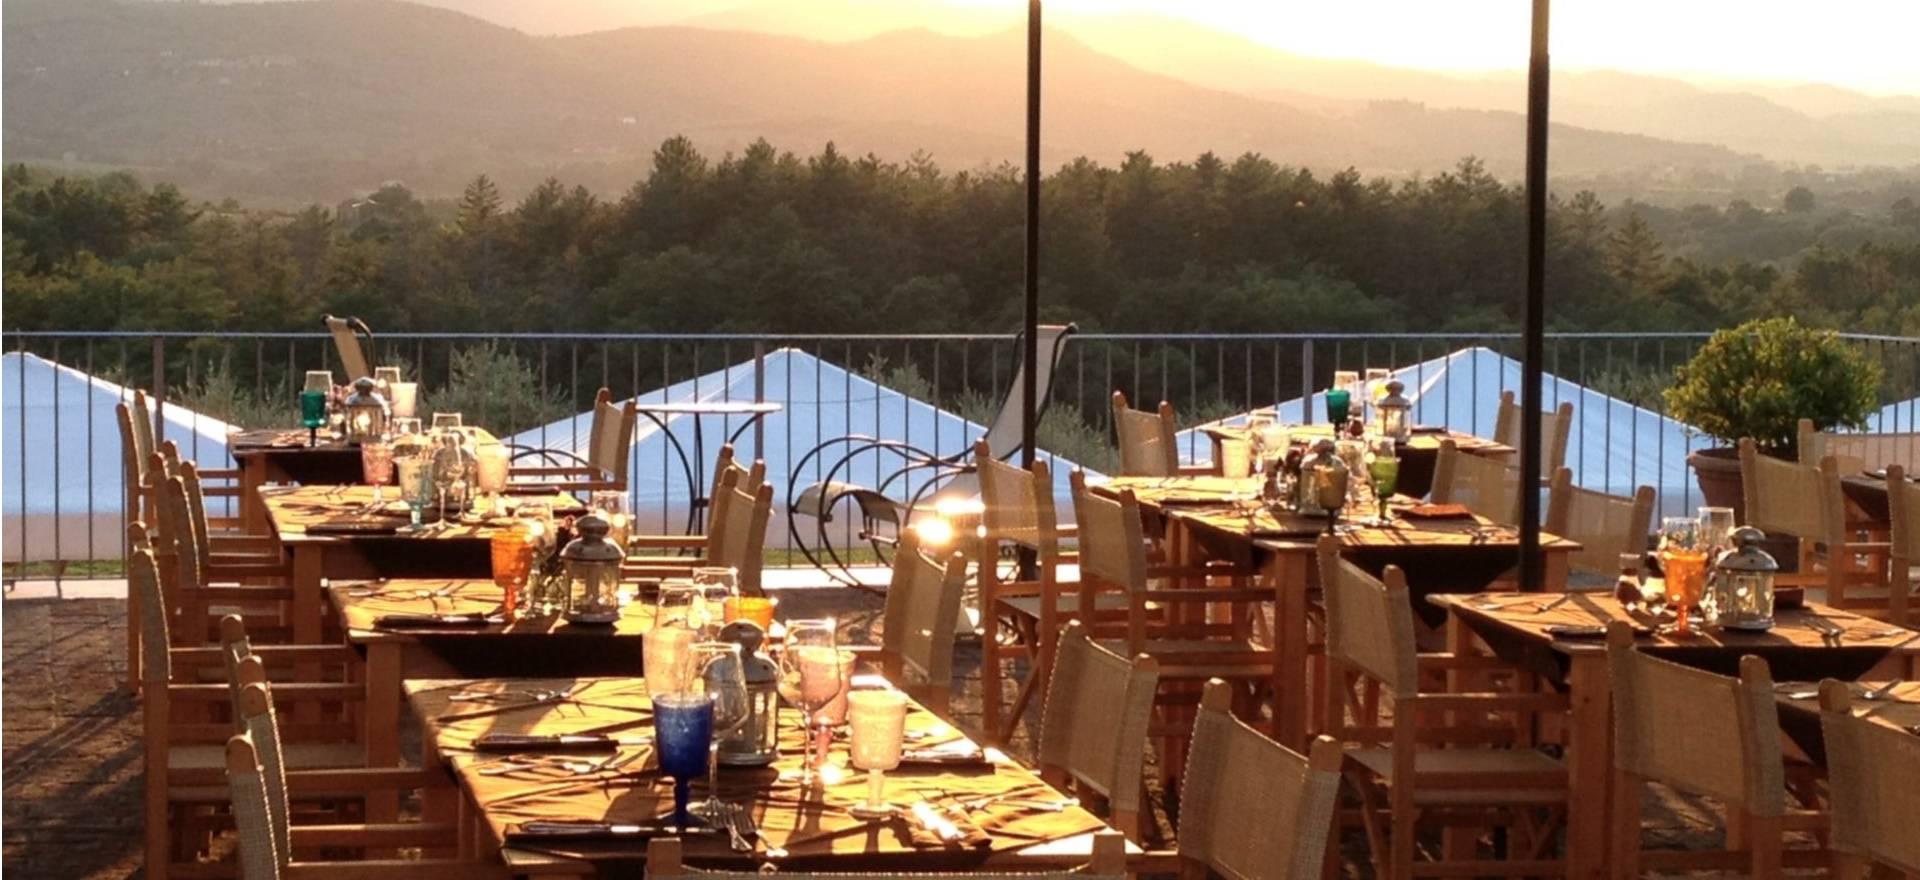 Agriturismo Toscane Agriturismo in Toscane met restaurant en panoramische wijnbar